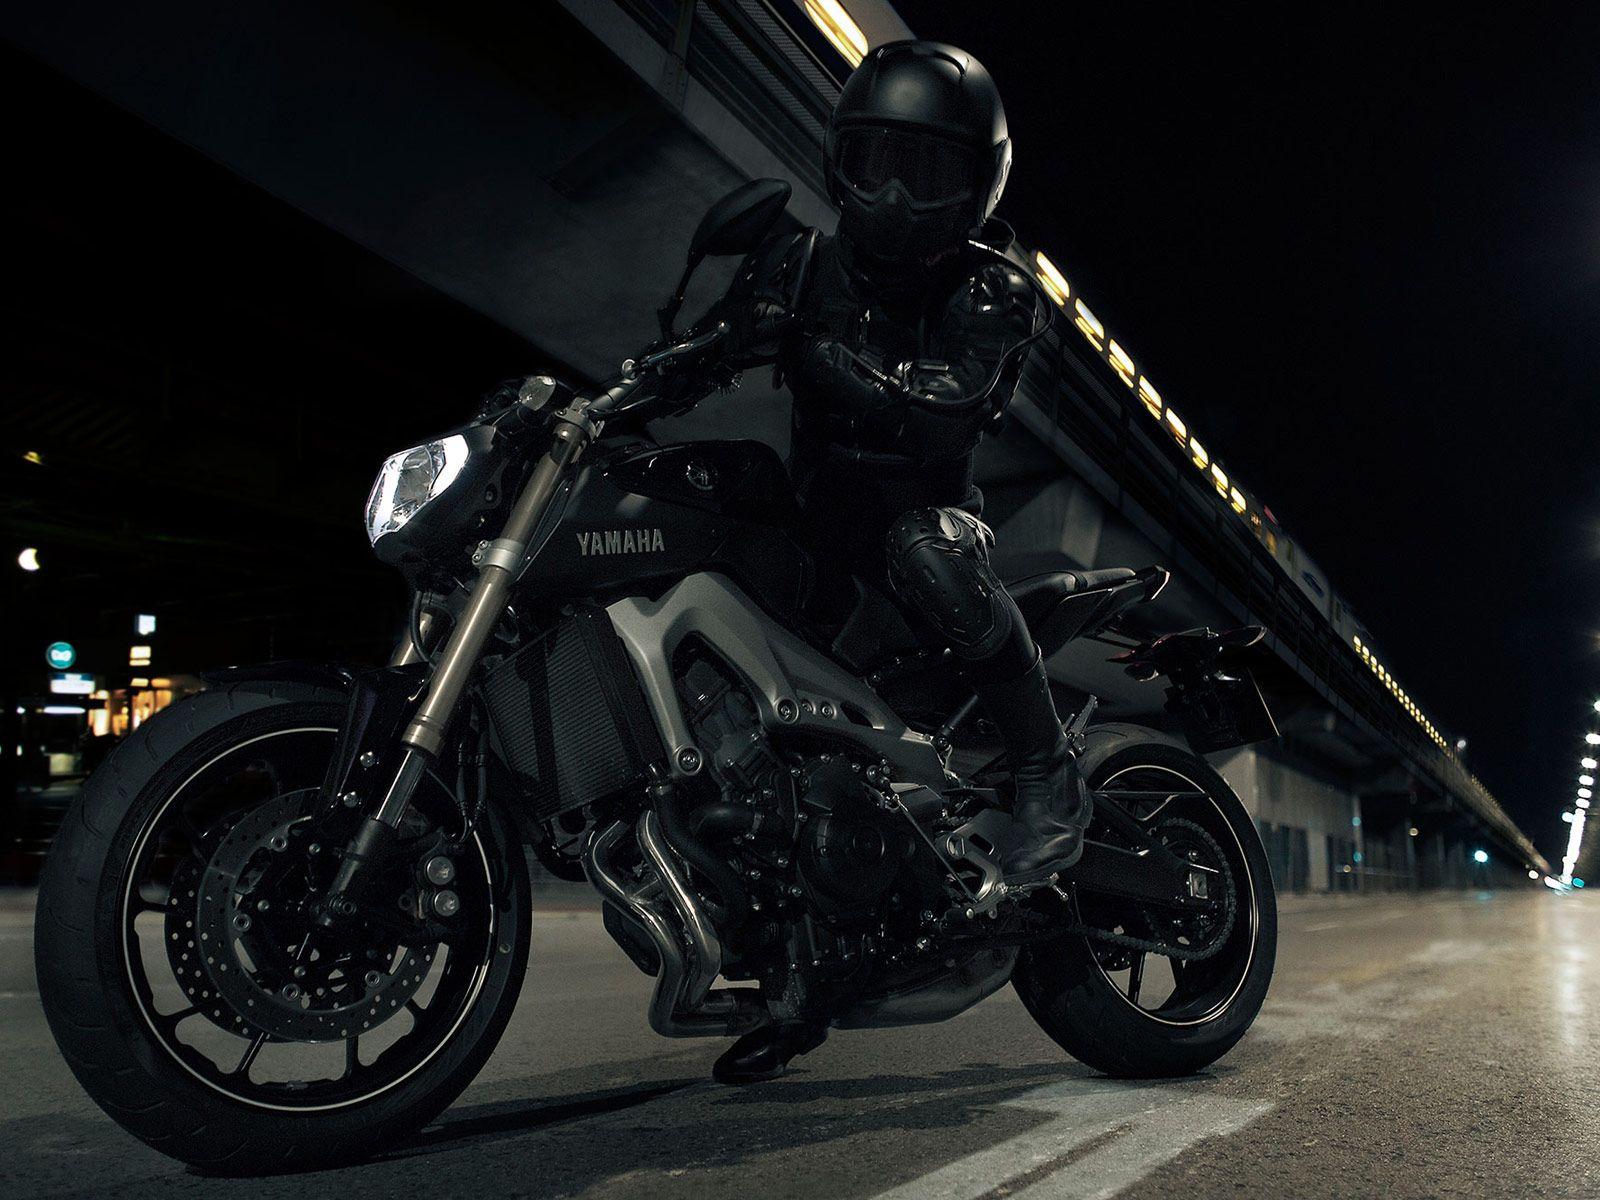 Wallpaper Yamaha Fz 10 Sportbikes 2017 Bikes Yamaha Hd: Yamaha FZ Black Rider Test Ride HD Wallpaper